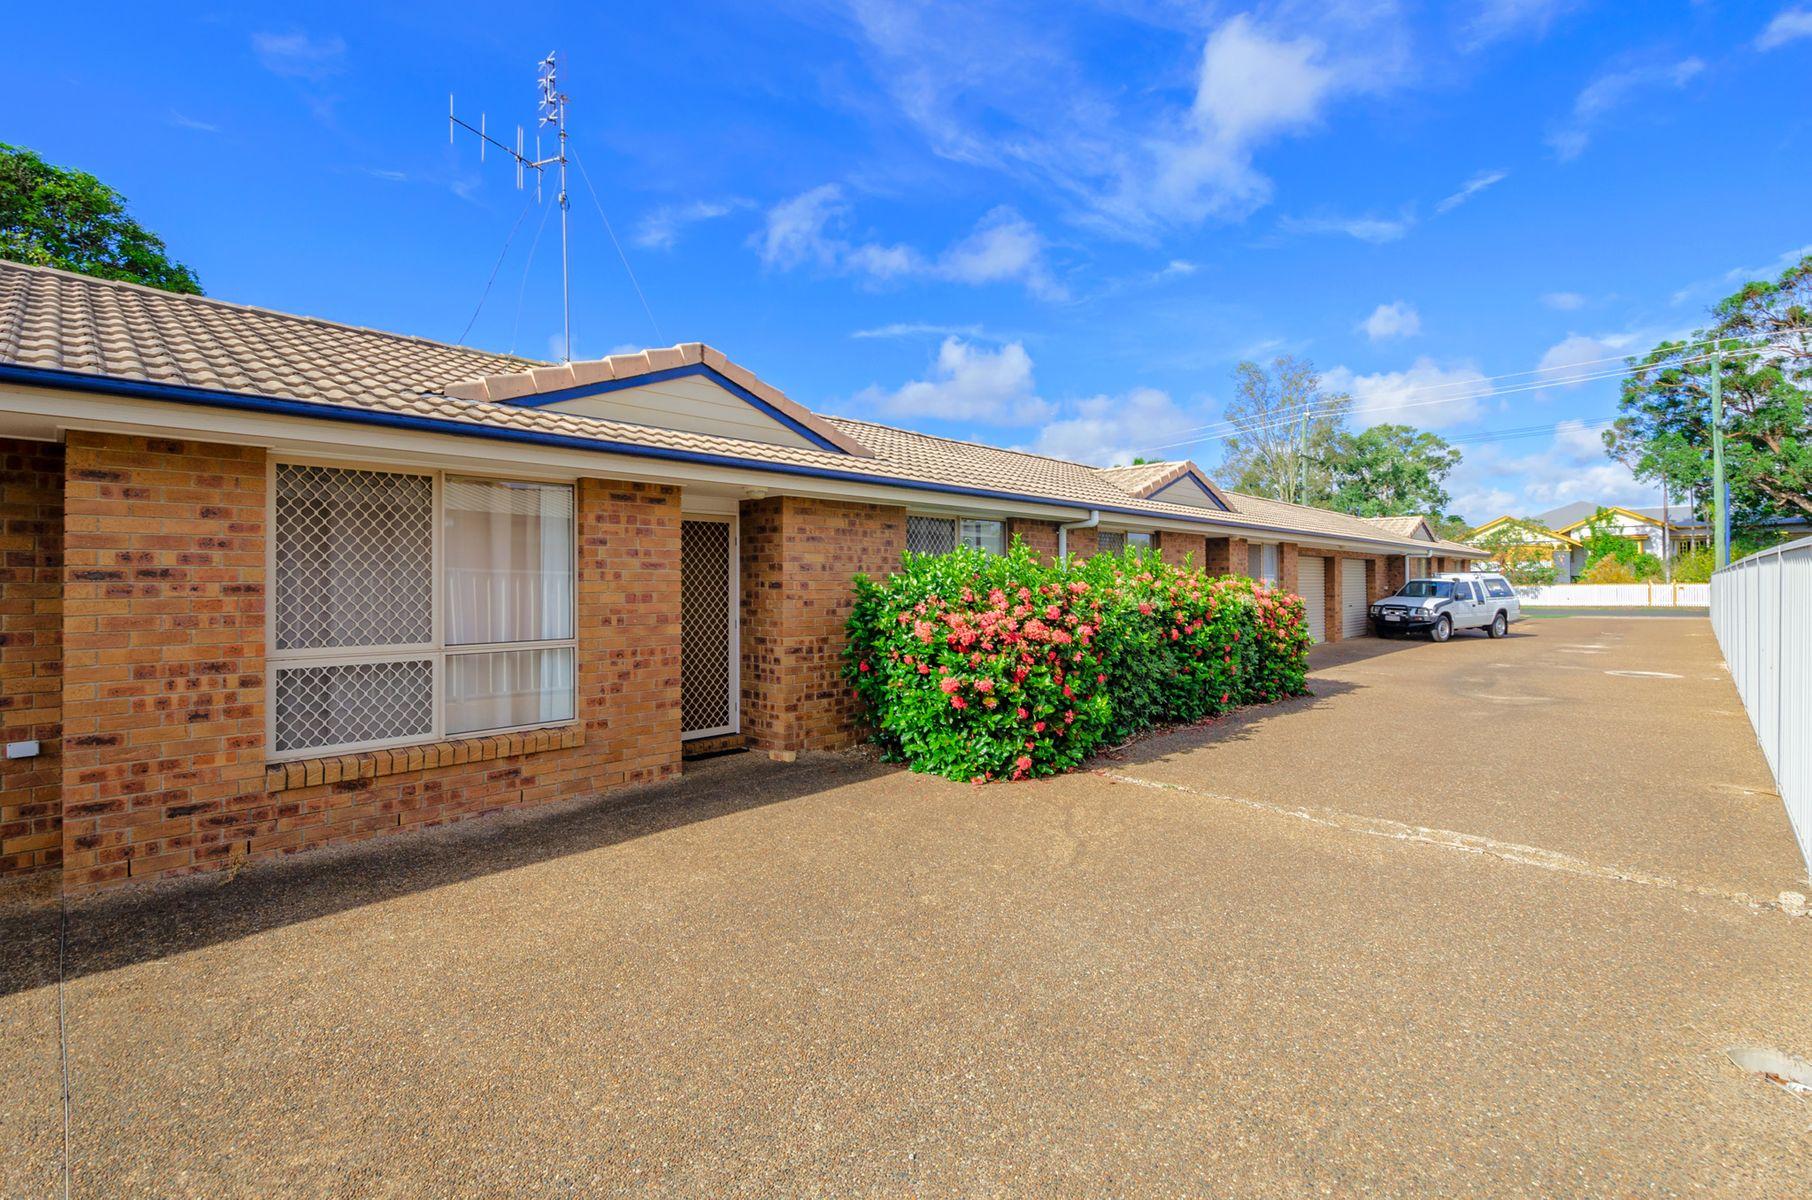 131 Targo Street, Bundaberg South, QLD 4670